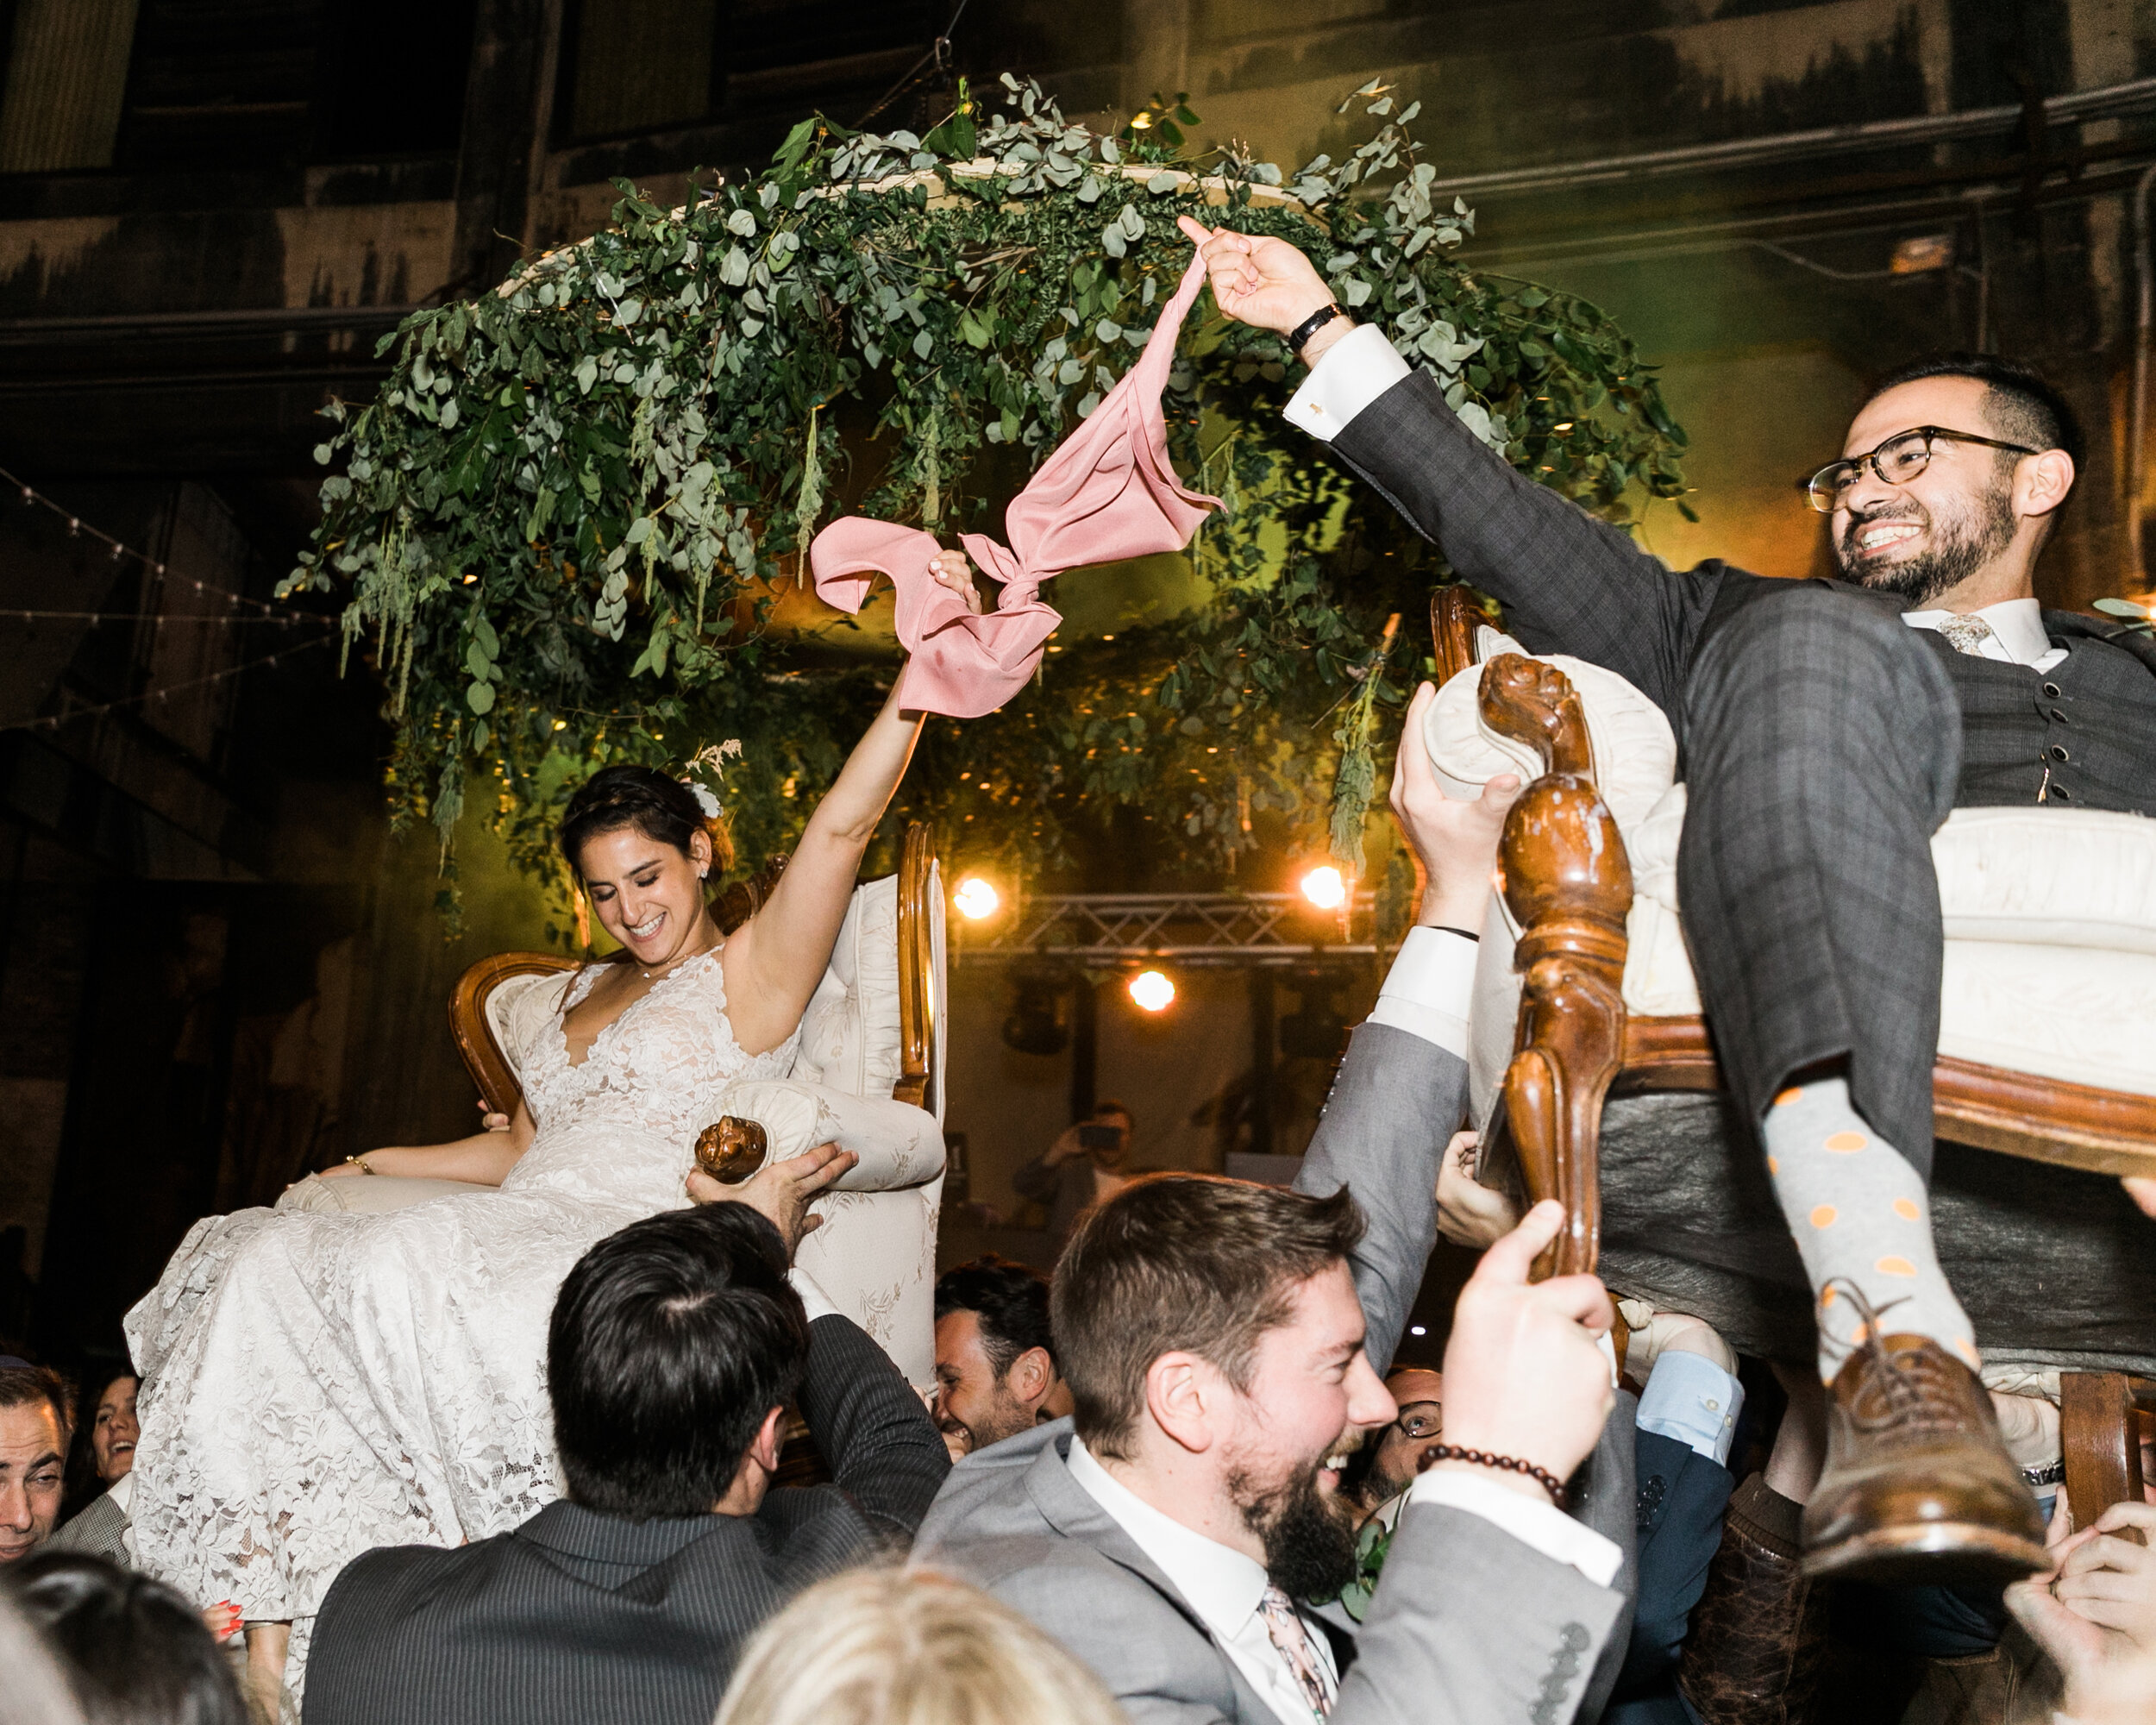 ivory-and-beau-blog-weddings-ivory-and-beau-couple-dominique-and-andres-savannah-florist-wedding-planning-savannah-bridal-boutique-wedding-flowers-KIP_WEBERWEDDING_RAILROADMUSEUM-1722.JPG